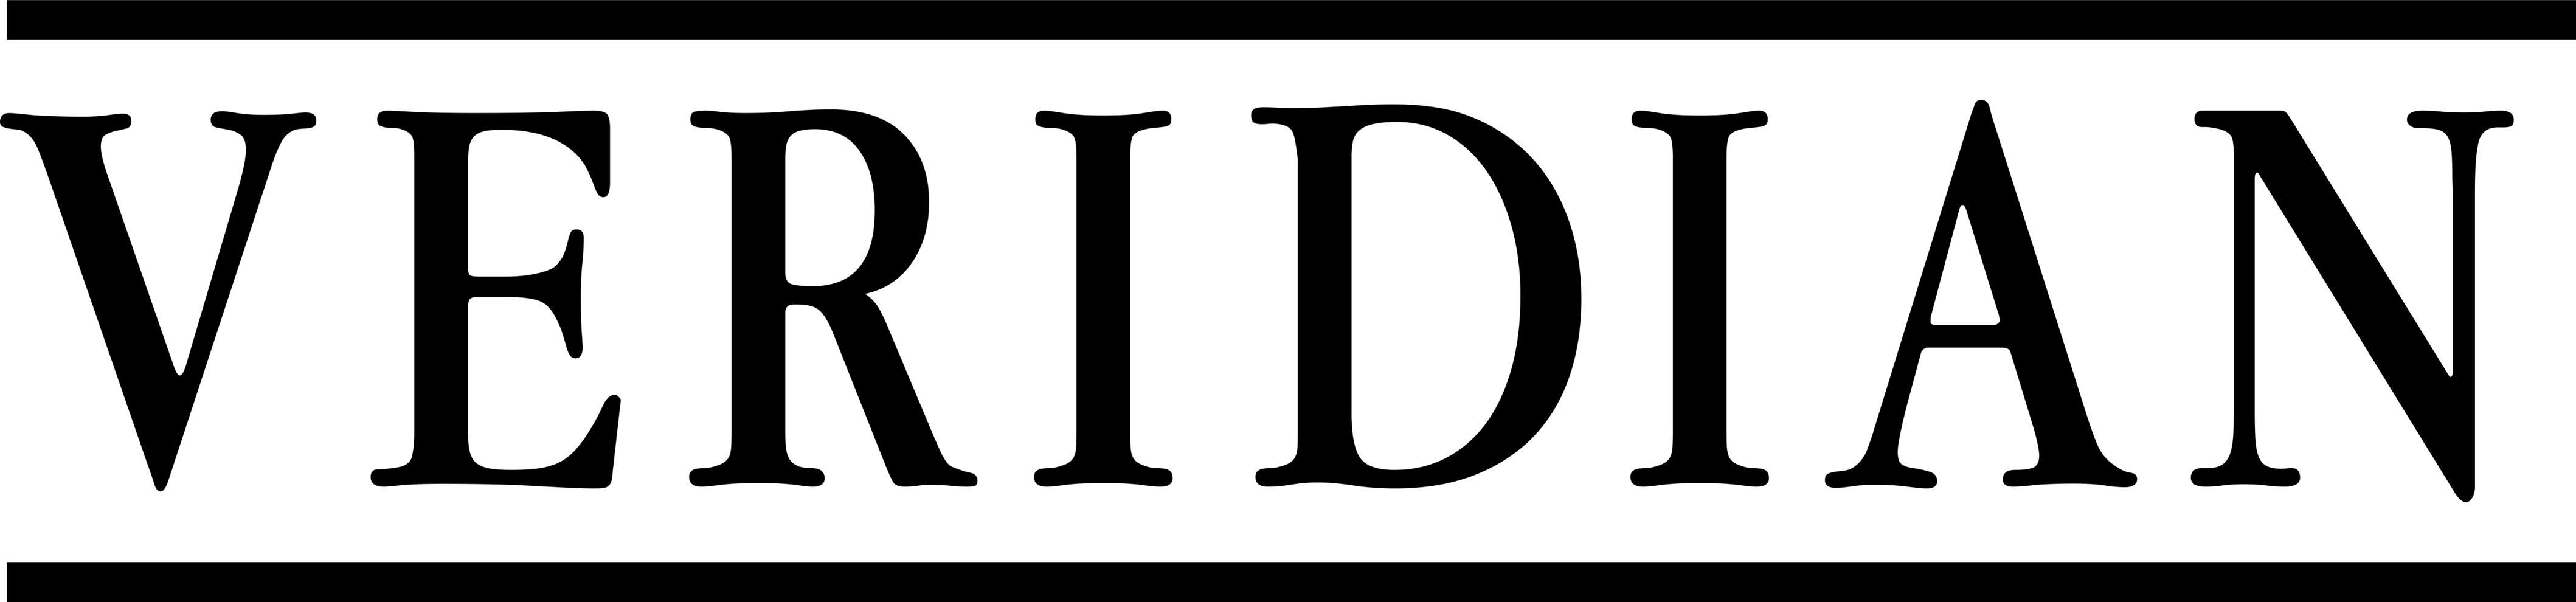 https://blovemusic.com/wp-content/uploads/2019/02/Veridian-logo-no-BG-w-bars.png